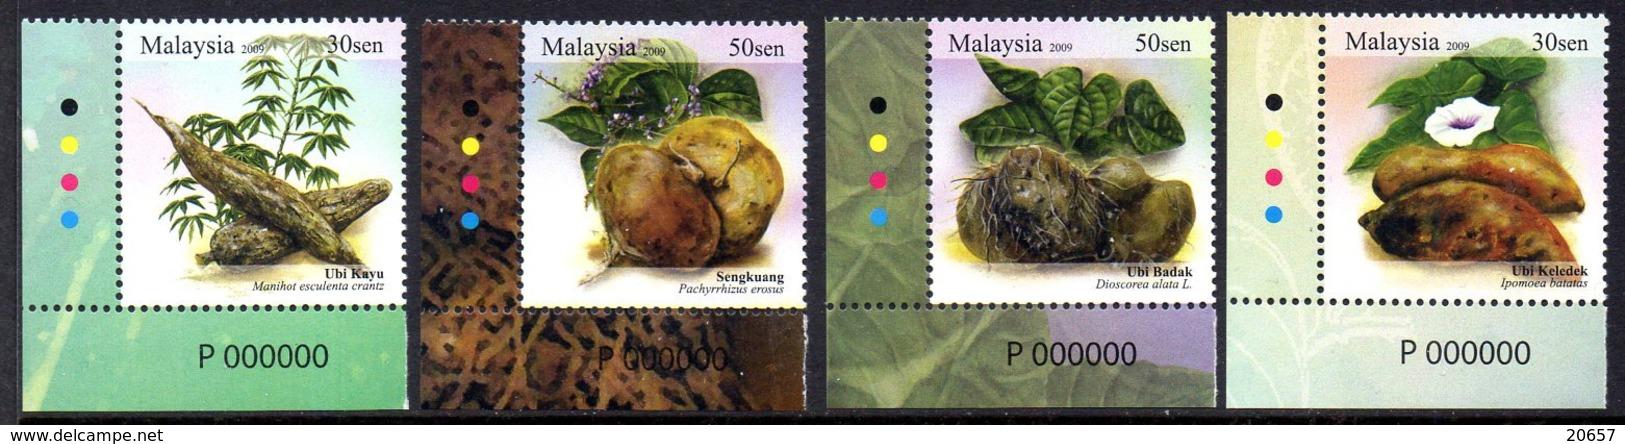 Malaisie Malaysia 1356/59 Légumes, Tubercules - Vegetables